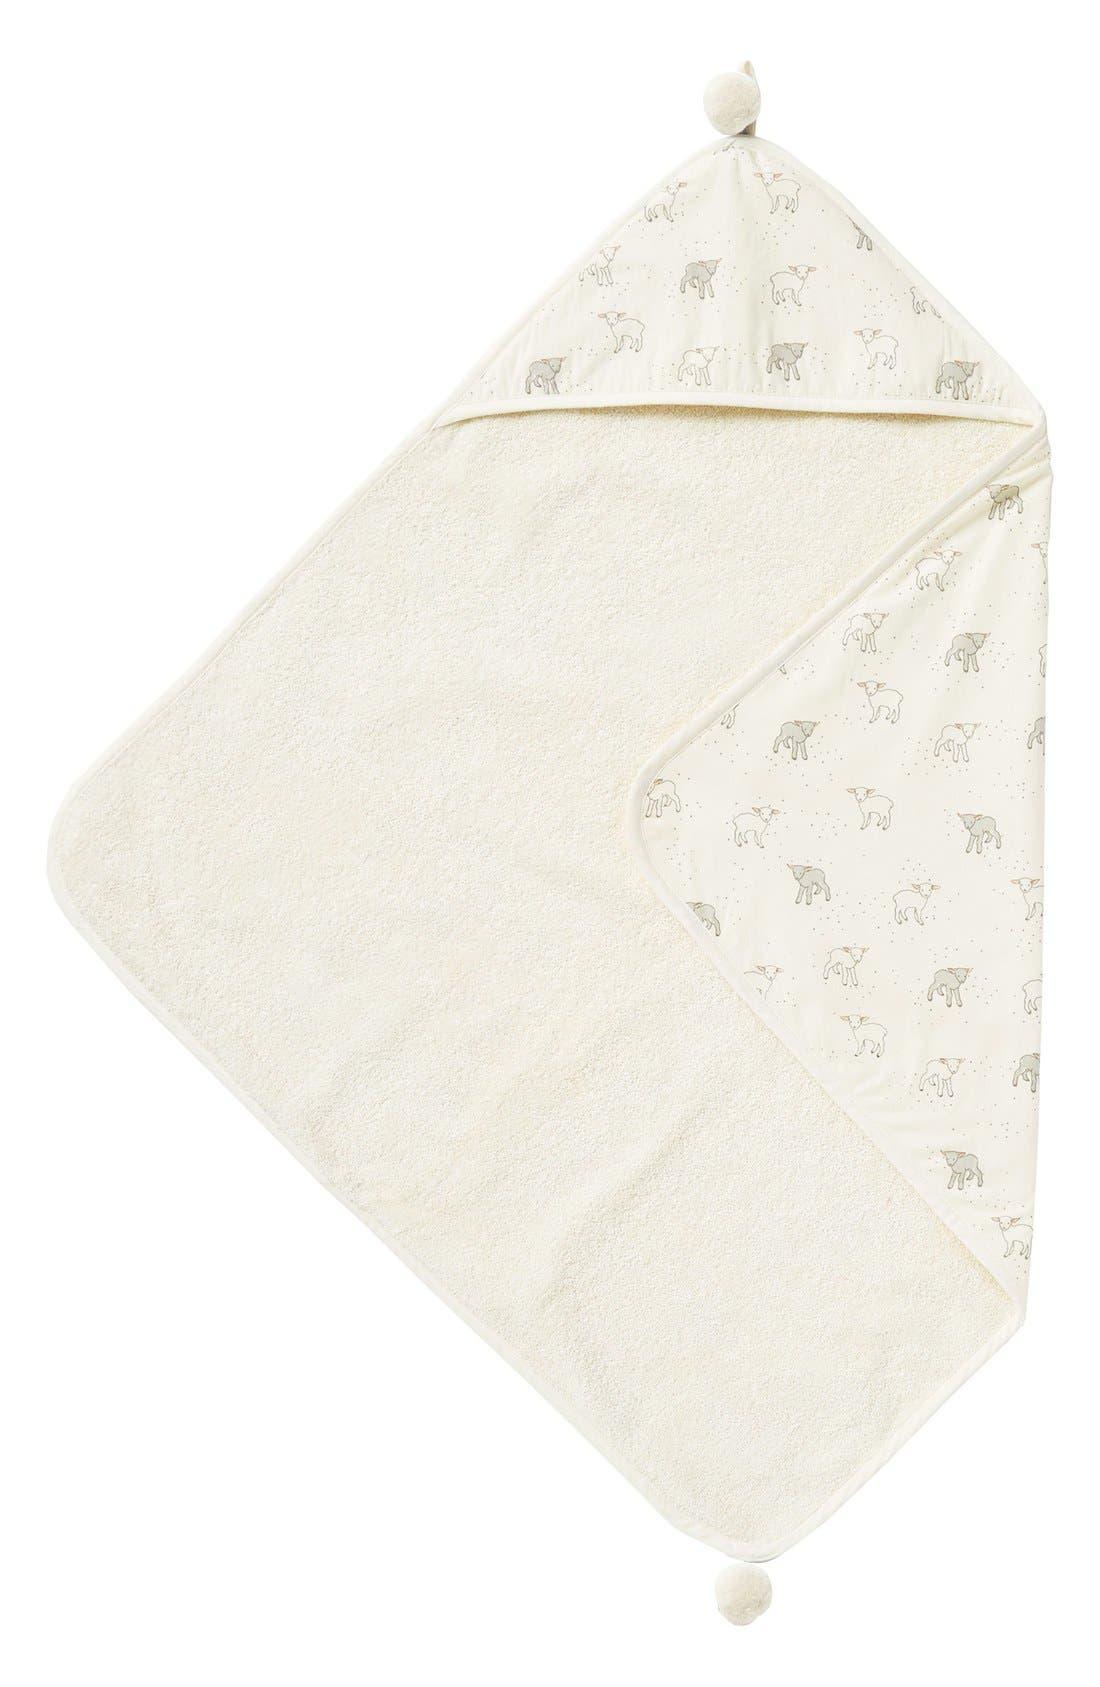 Little Lamb Print Hooded Towel,                         Main,                         color, Cream